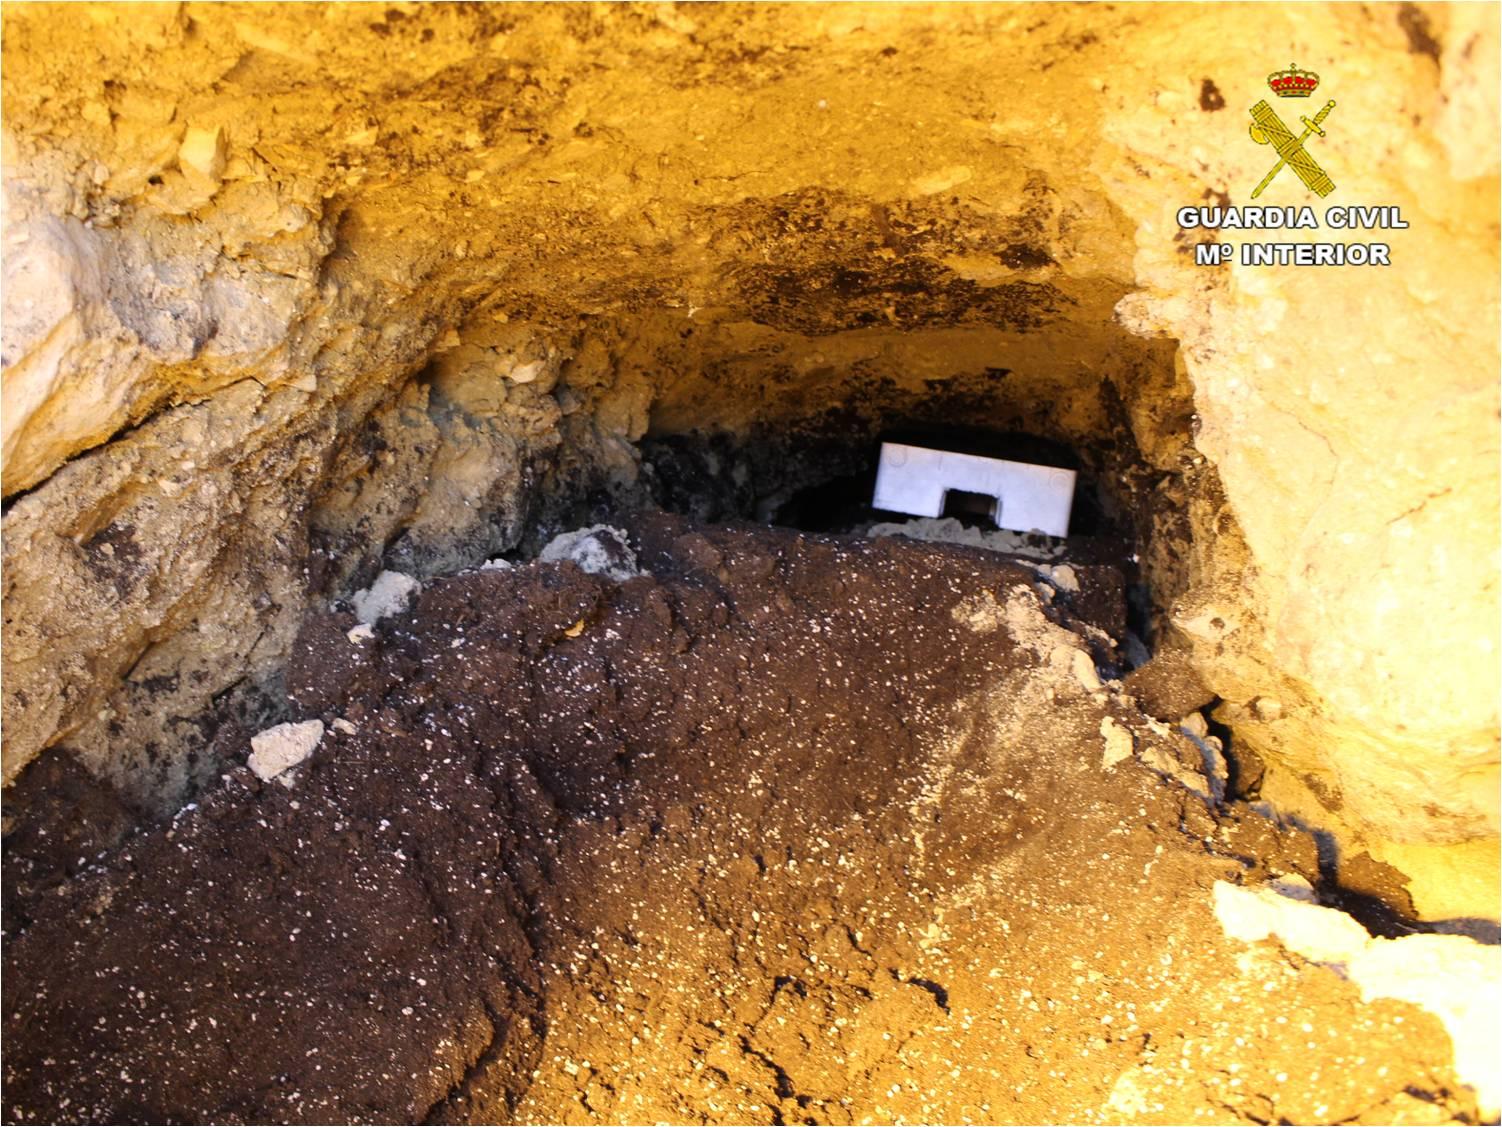 Túnel subterráneo para abastecer de luz de forma ilegal